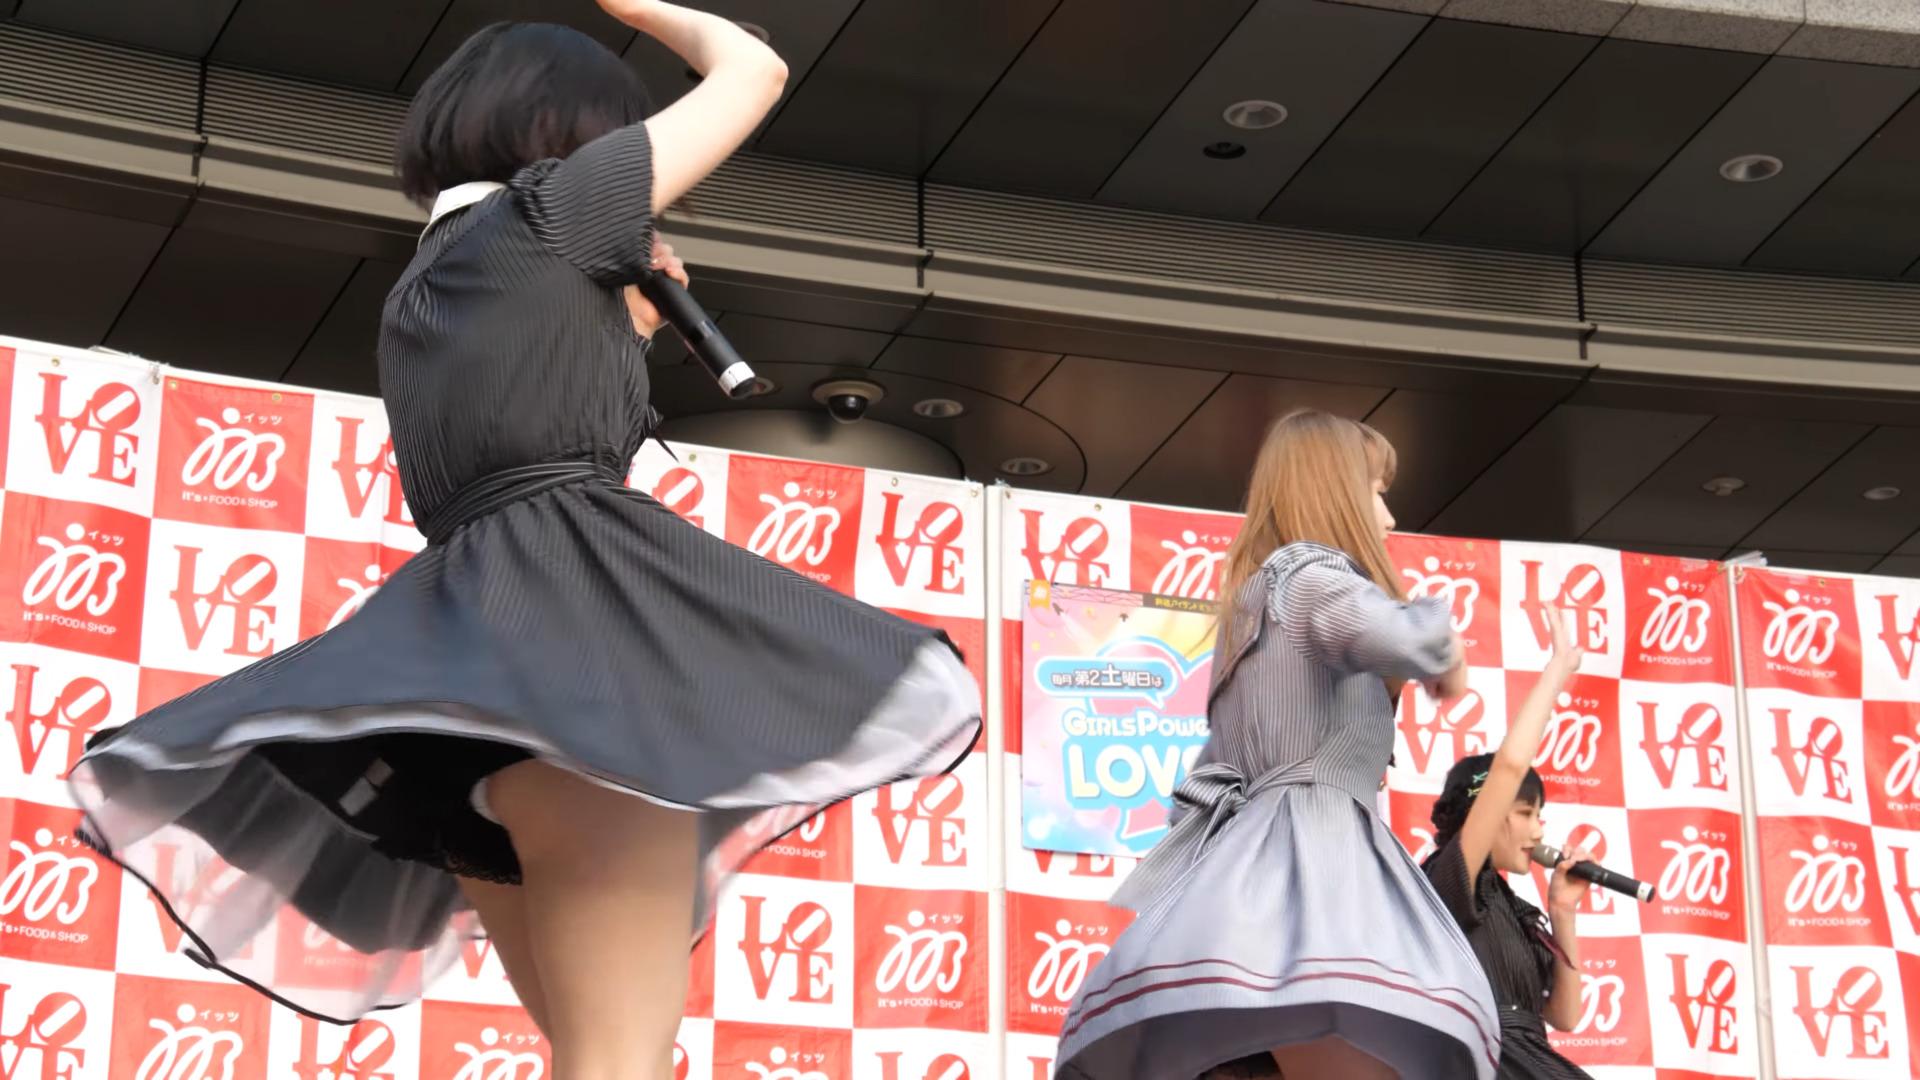 SCRamBLE 【夜中の3時】 GIRLS POWER LOVE祭り 02:00